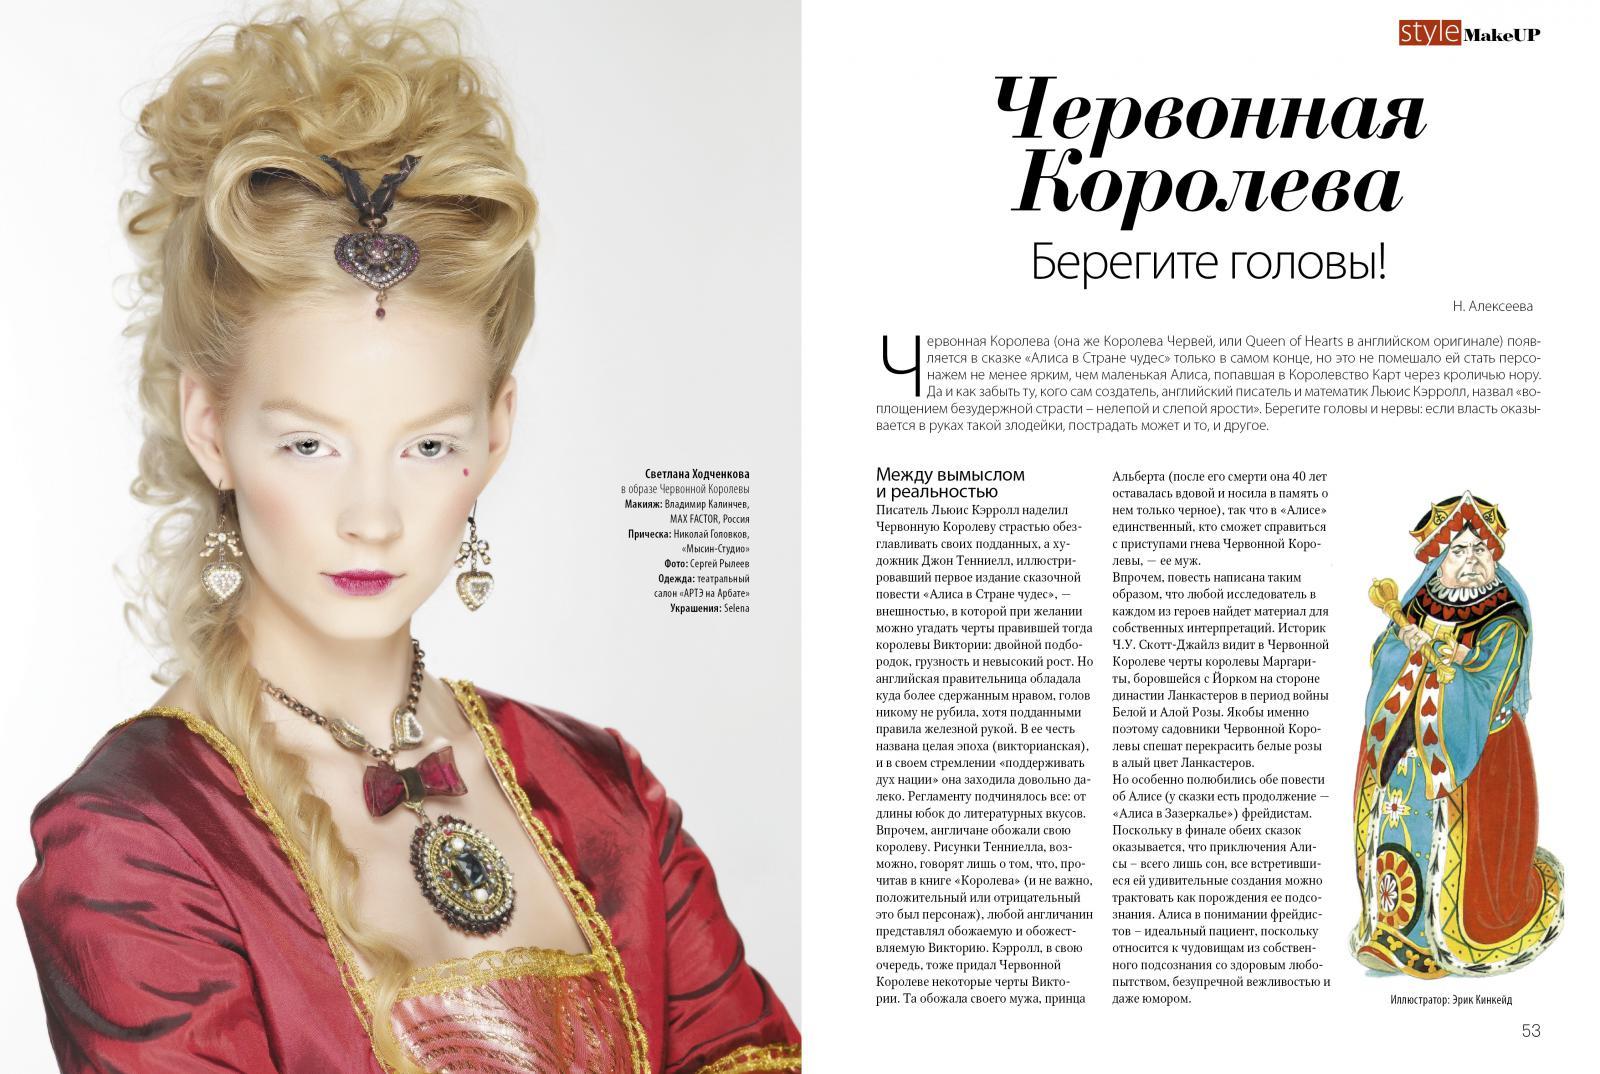 Hodchenkova Queen 11-2008.jpg